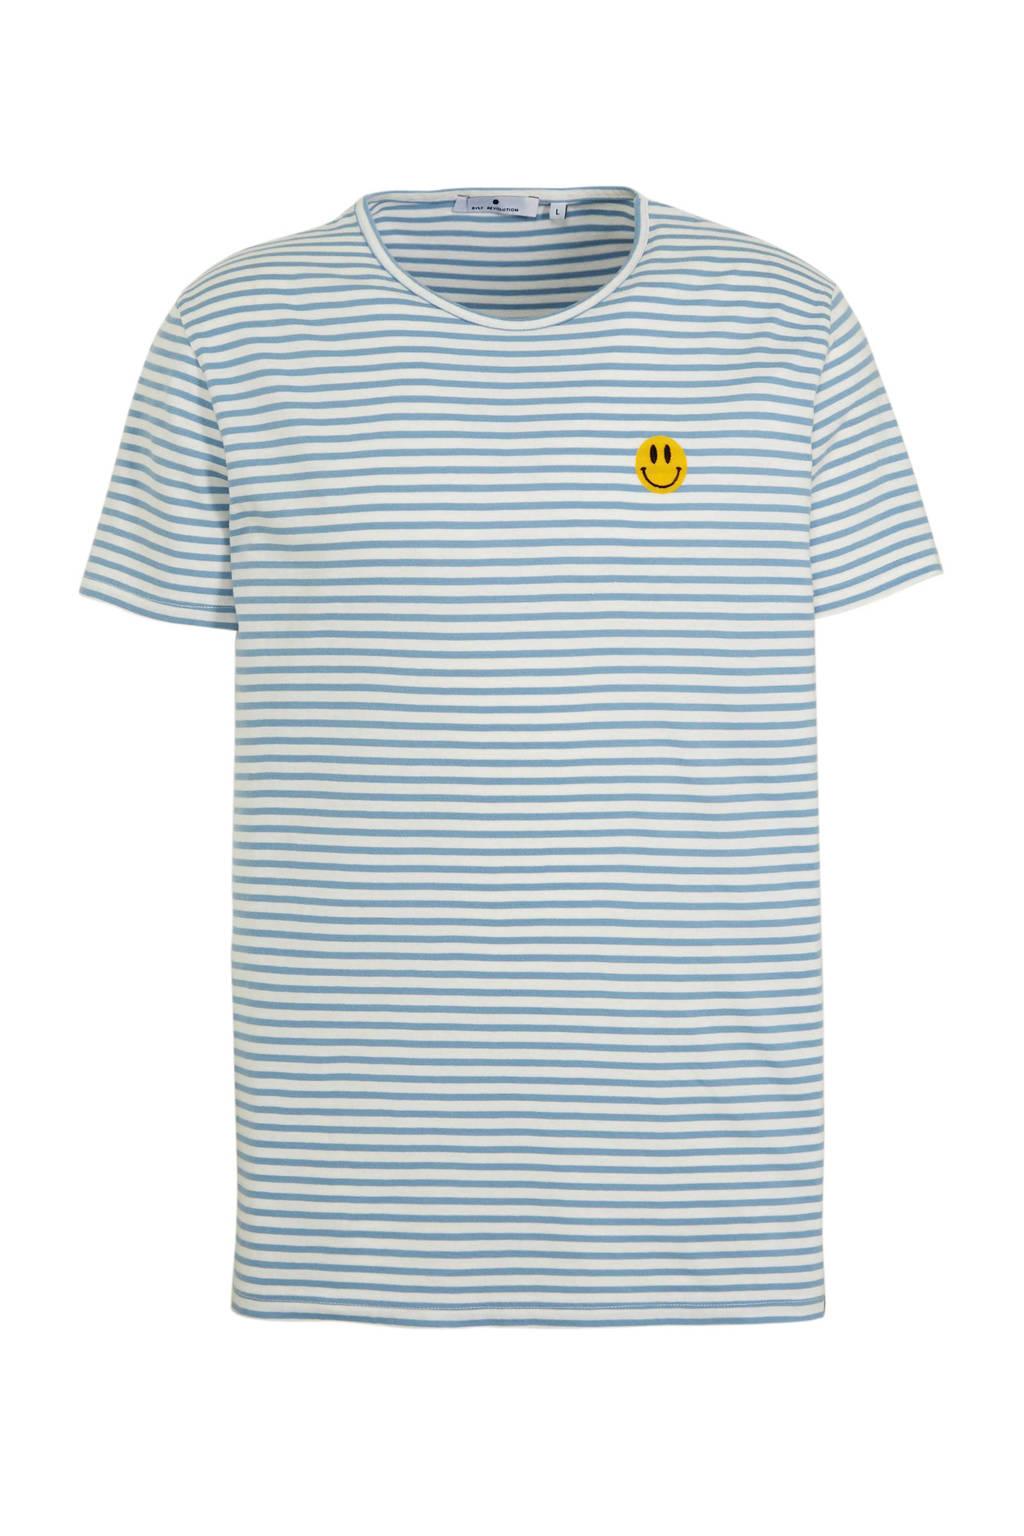 RVLT gestreept T-shirt lichtblauw/wot, Lichtblauw/wot